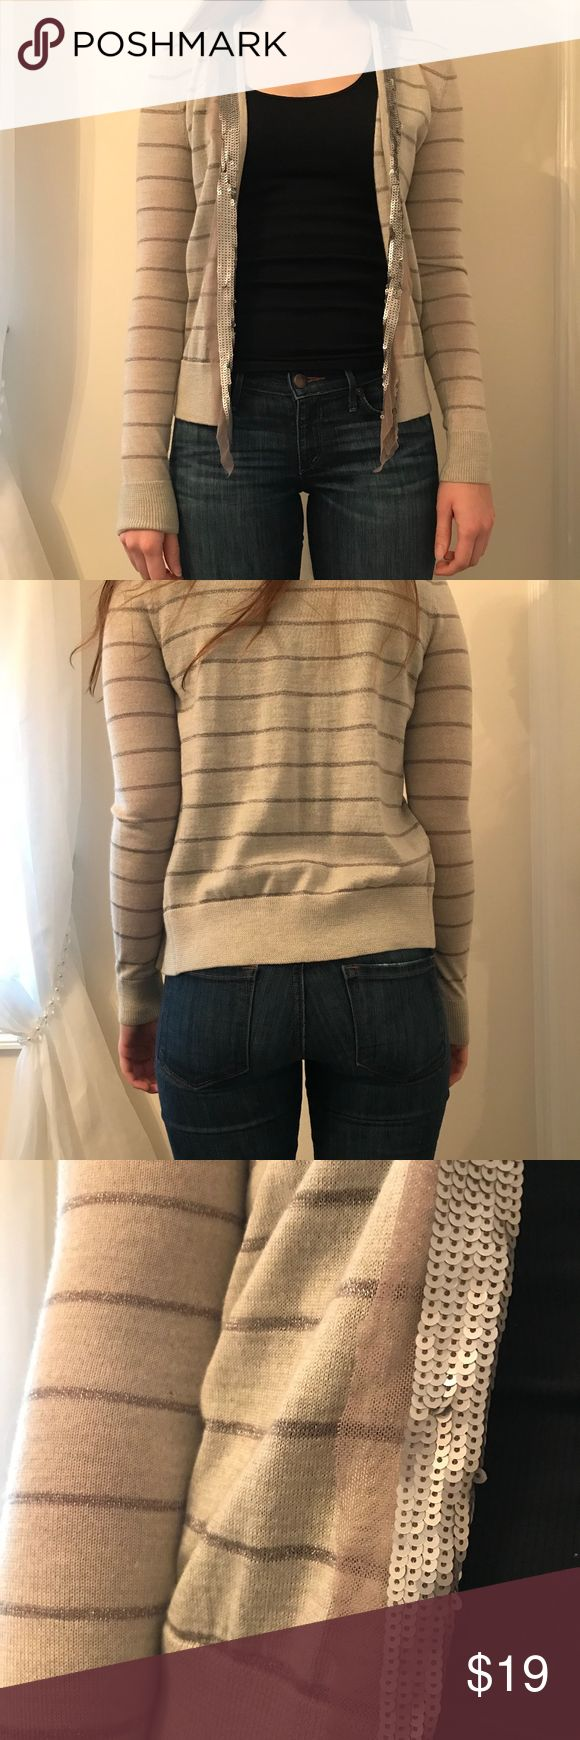 "Ann Taylor Loft Striped Metallic Cardigan Ann Taylor Loft striped metallic cardigan. Detailed sequin lapel, lightweight, worn less then 5 times. Size S, 50% acrylic, 47% wool 1% mohair   Model Measurements: Height: 5' 7"" Hips: 36.5"" Waist: 26.5"" Bust: 31.5"" LOFT Sweaters Cardigans"